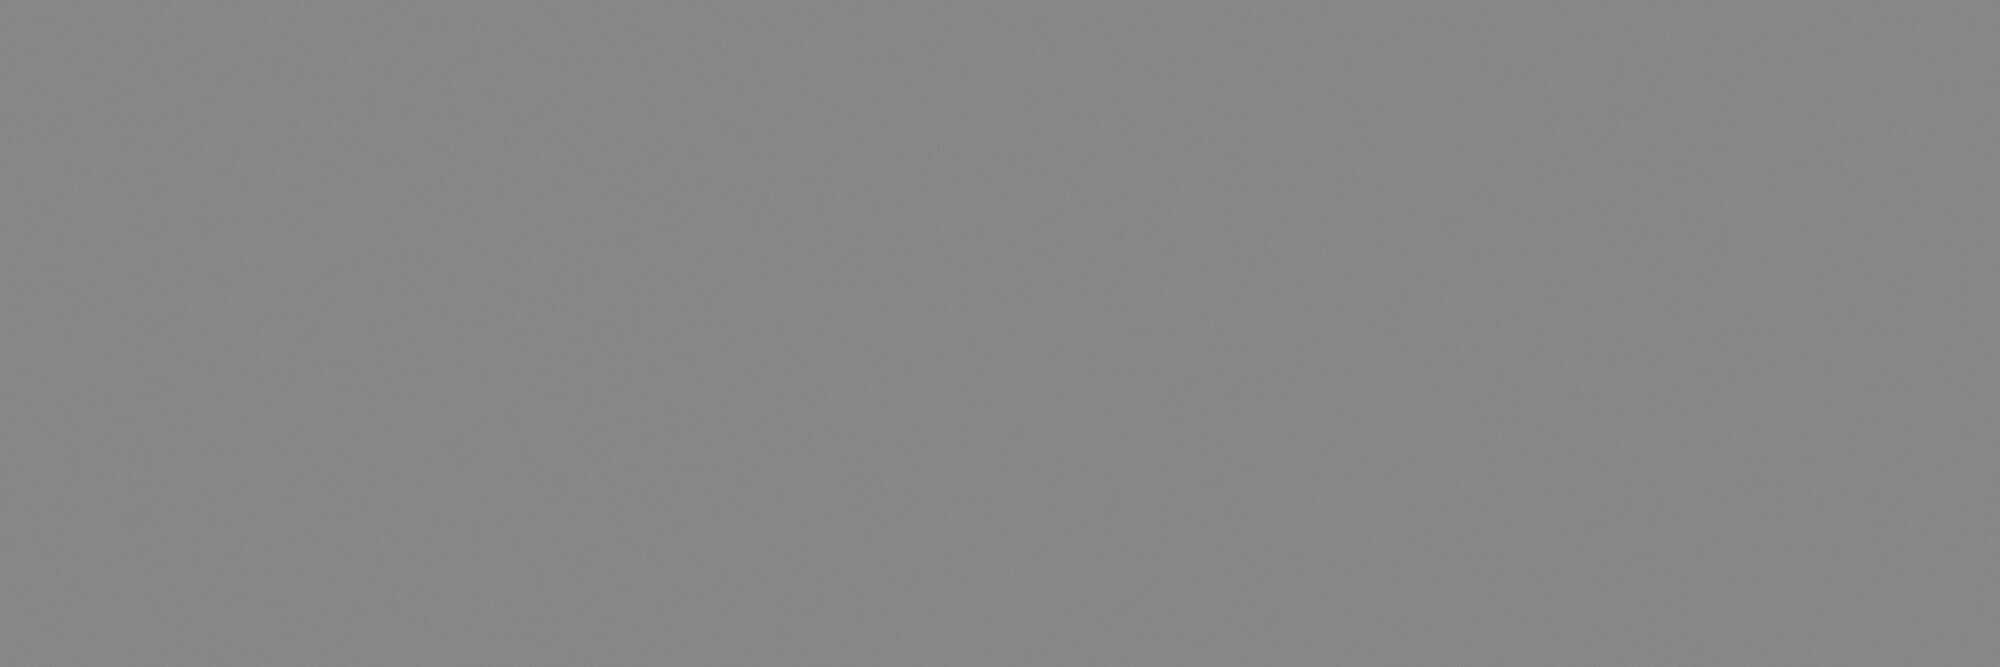 78ba31e coverlam basic gris 100×300 rgb